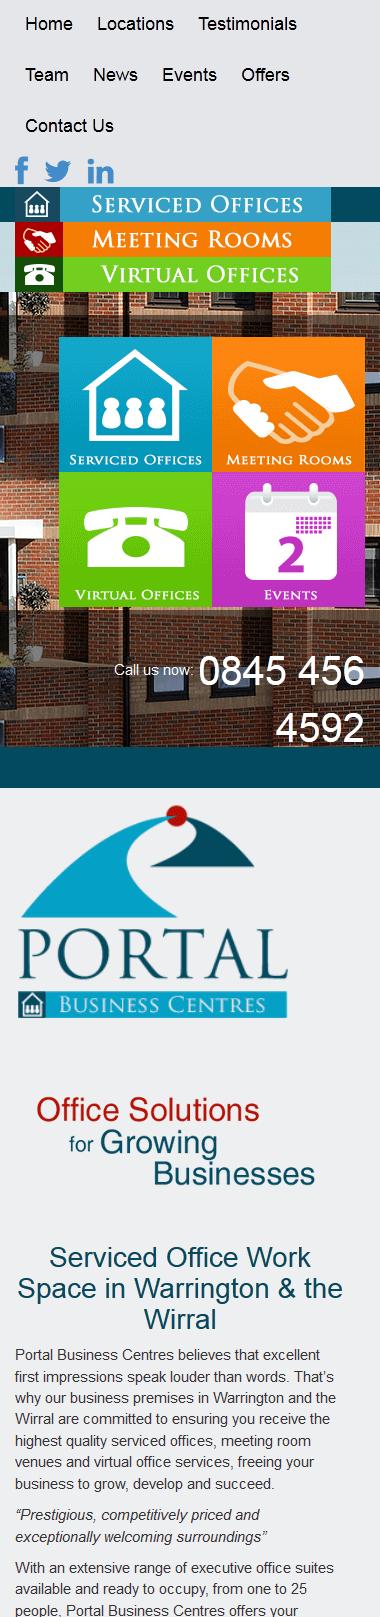 portal-mobile